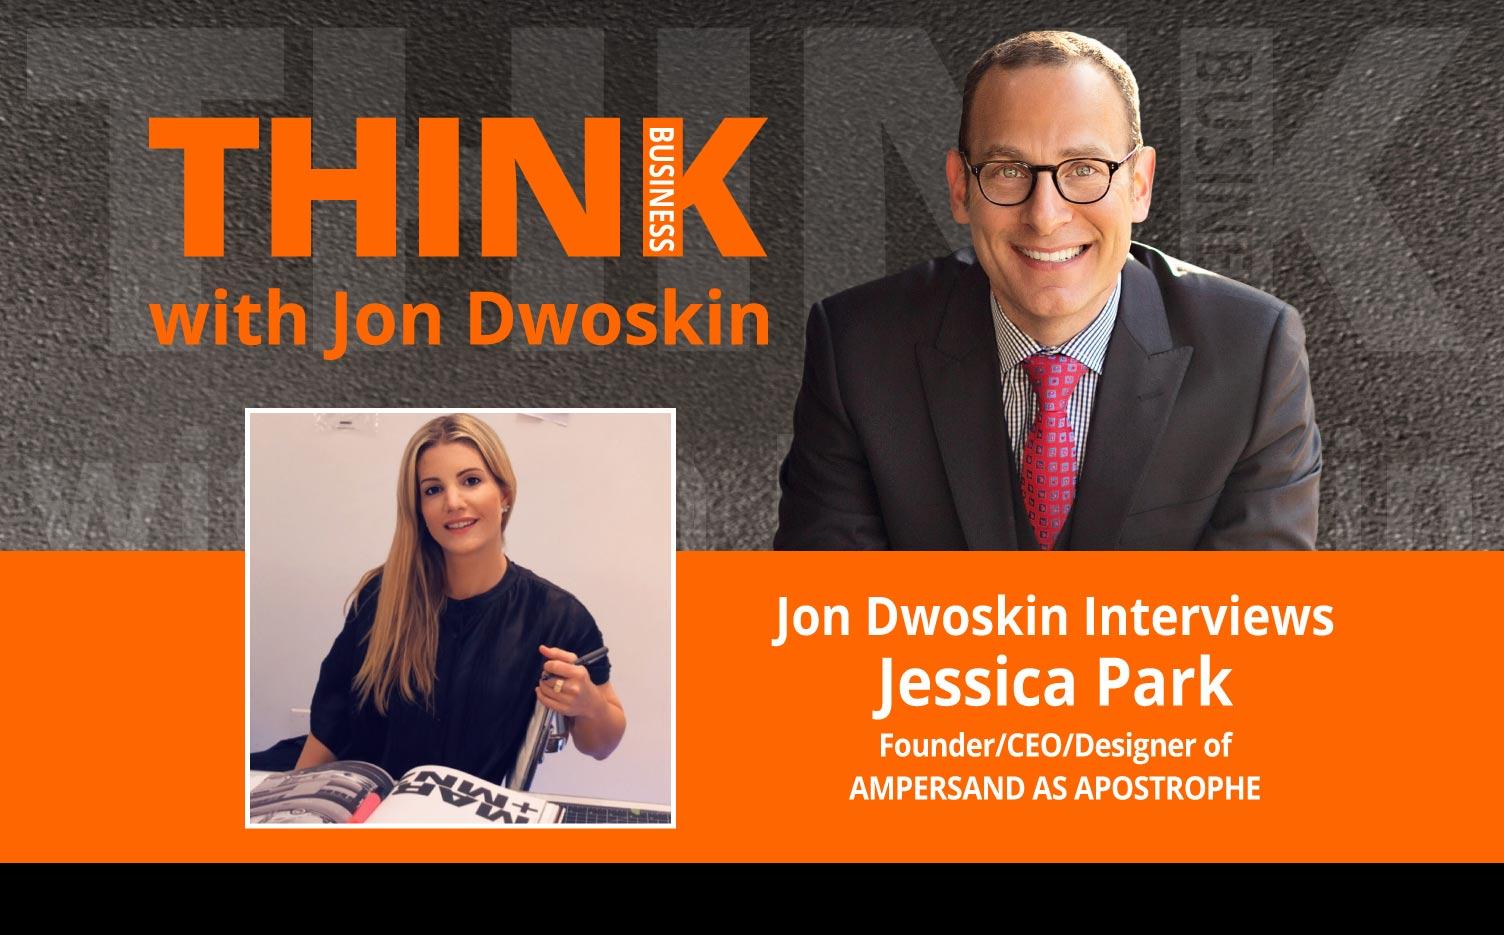 THINK Business-Podcast-Jon Dwoskin Interviews Jessica-Park